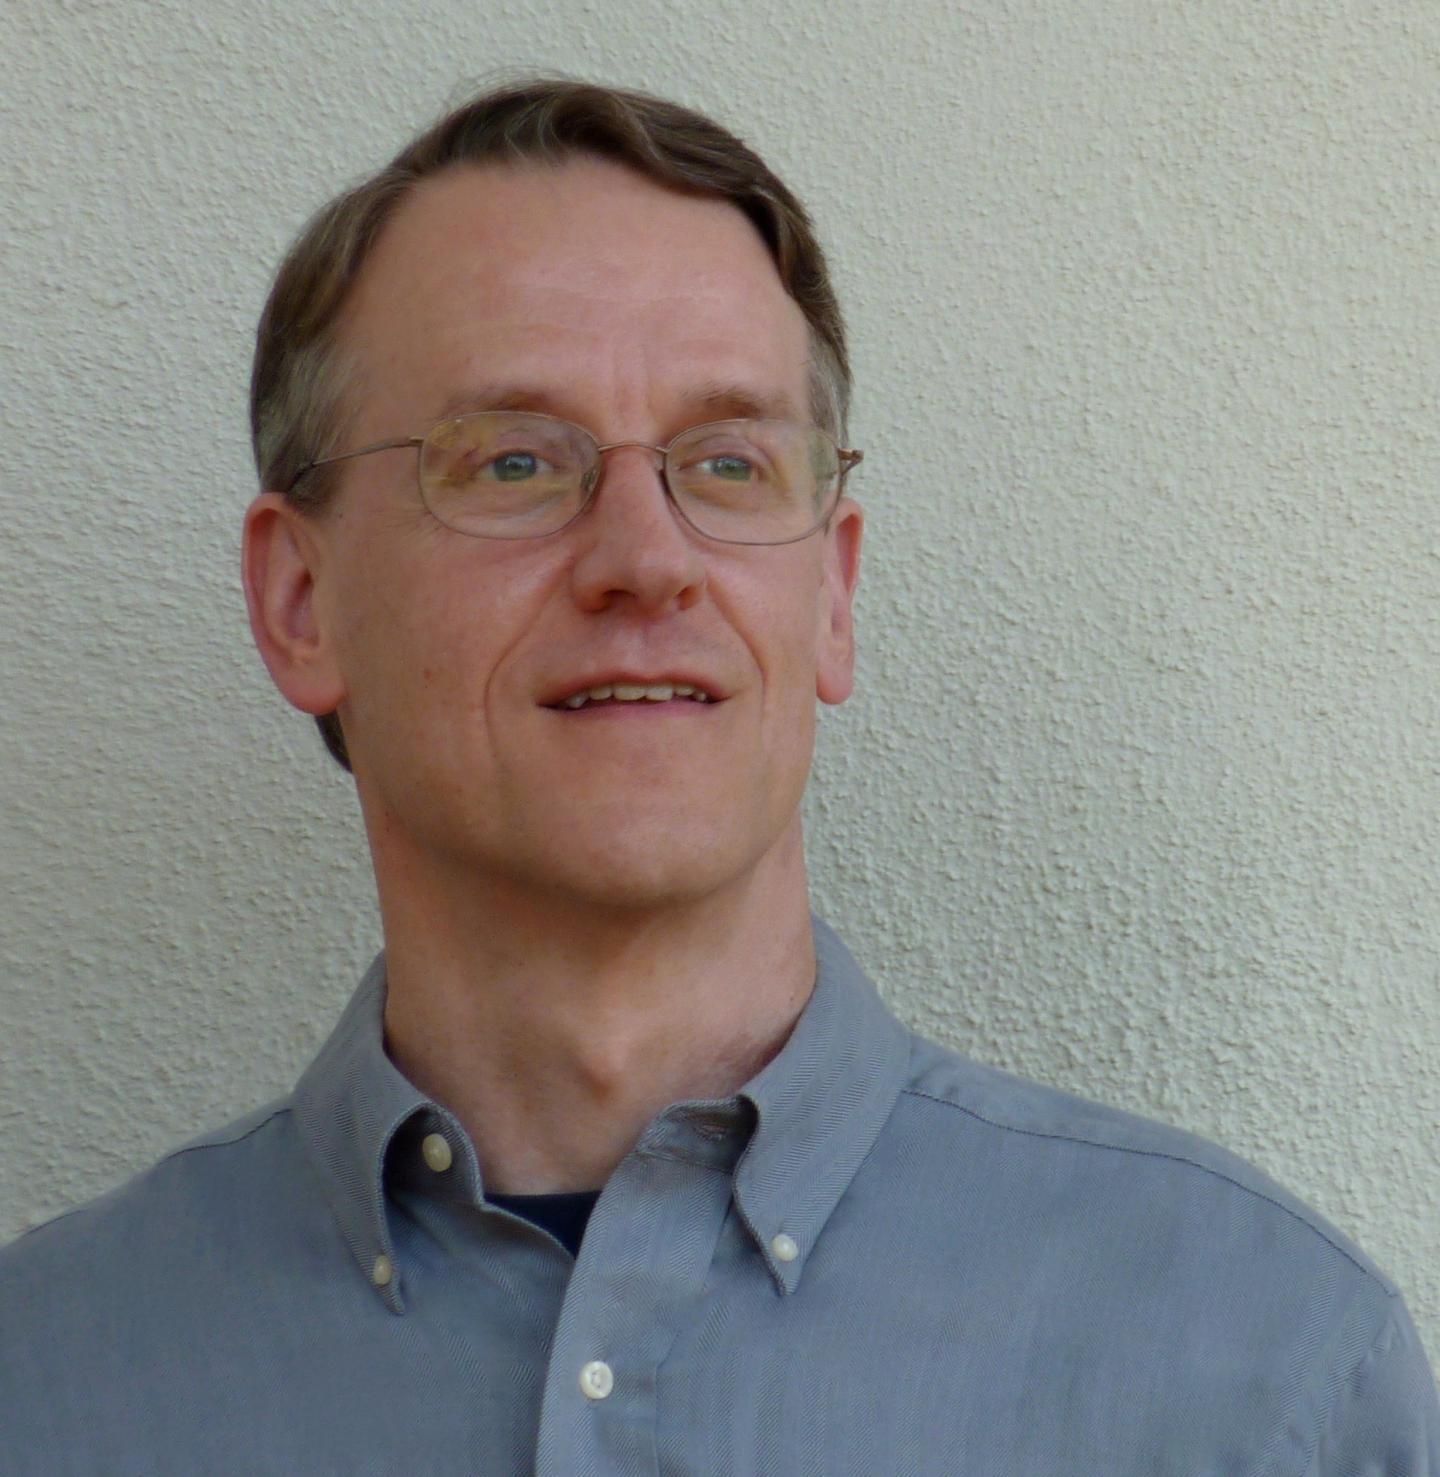 David Kingsley, Genetics Society of America